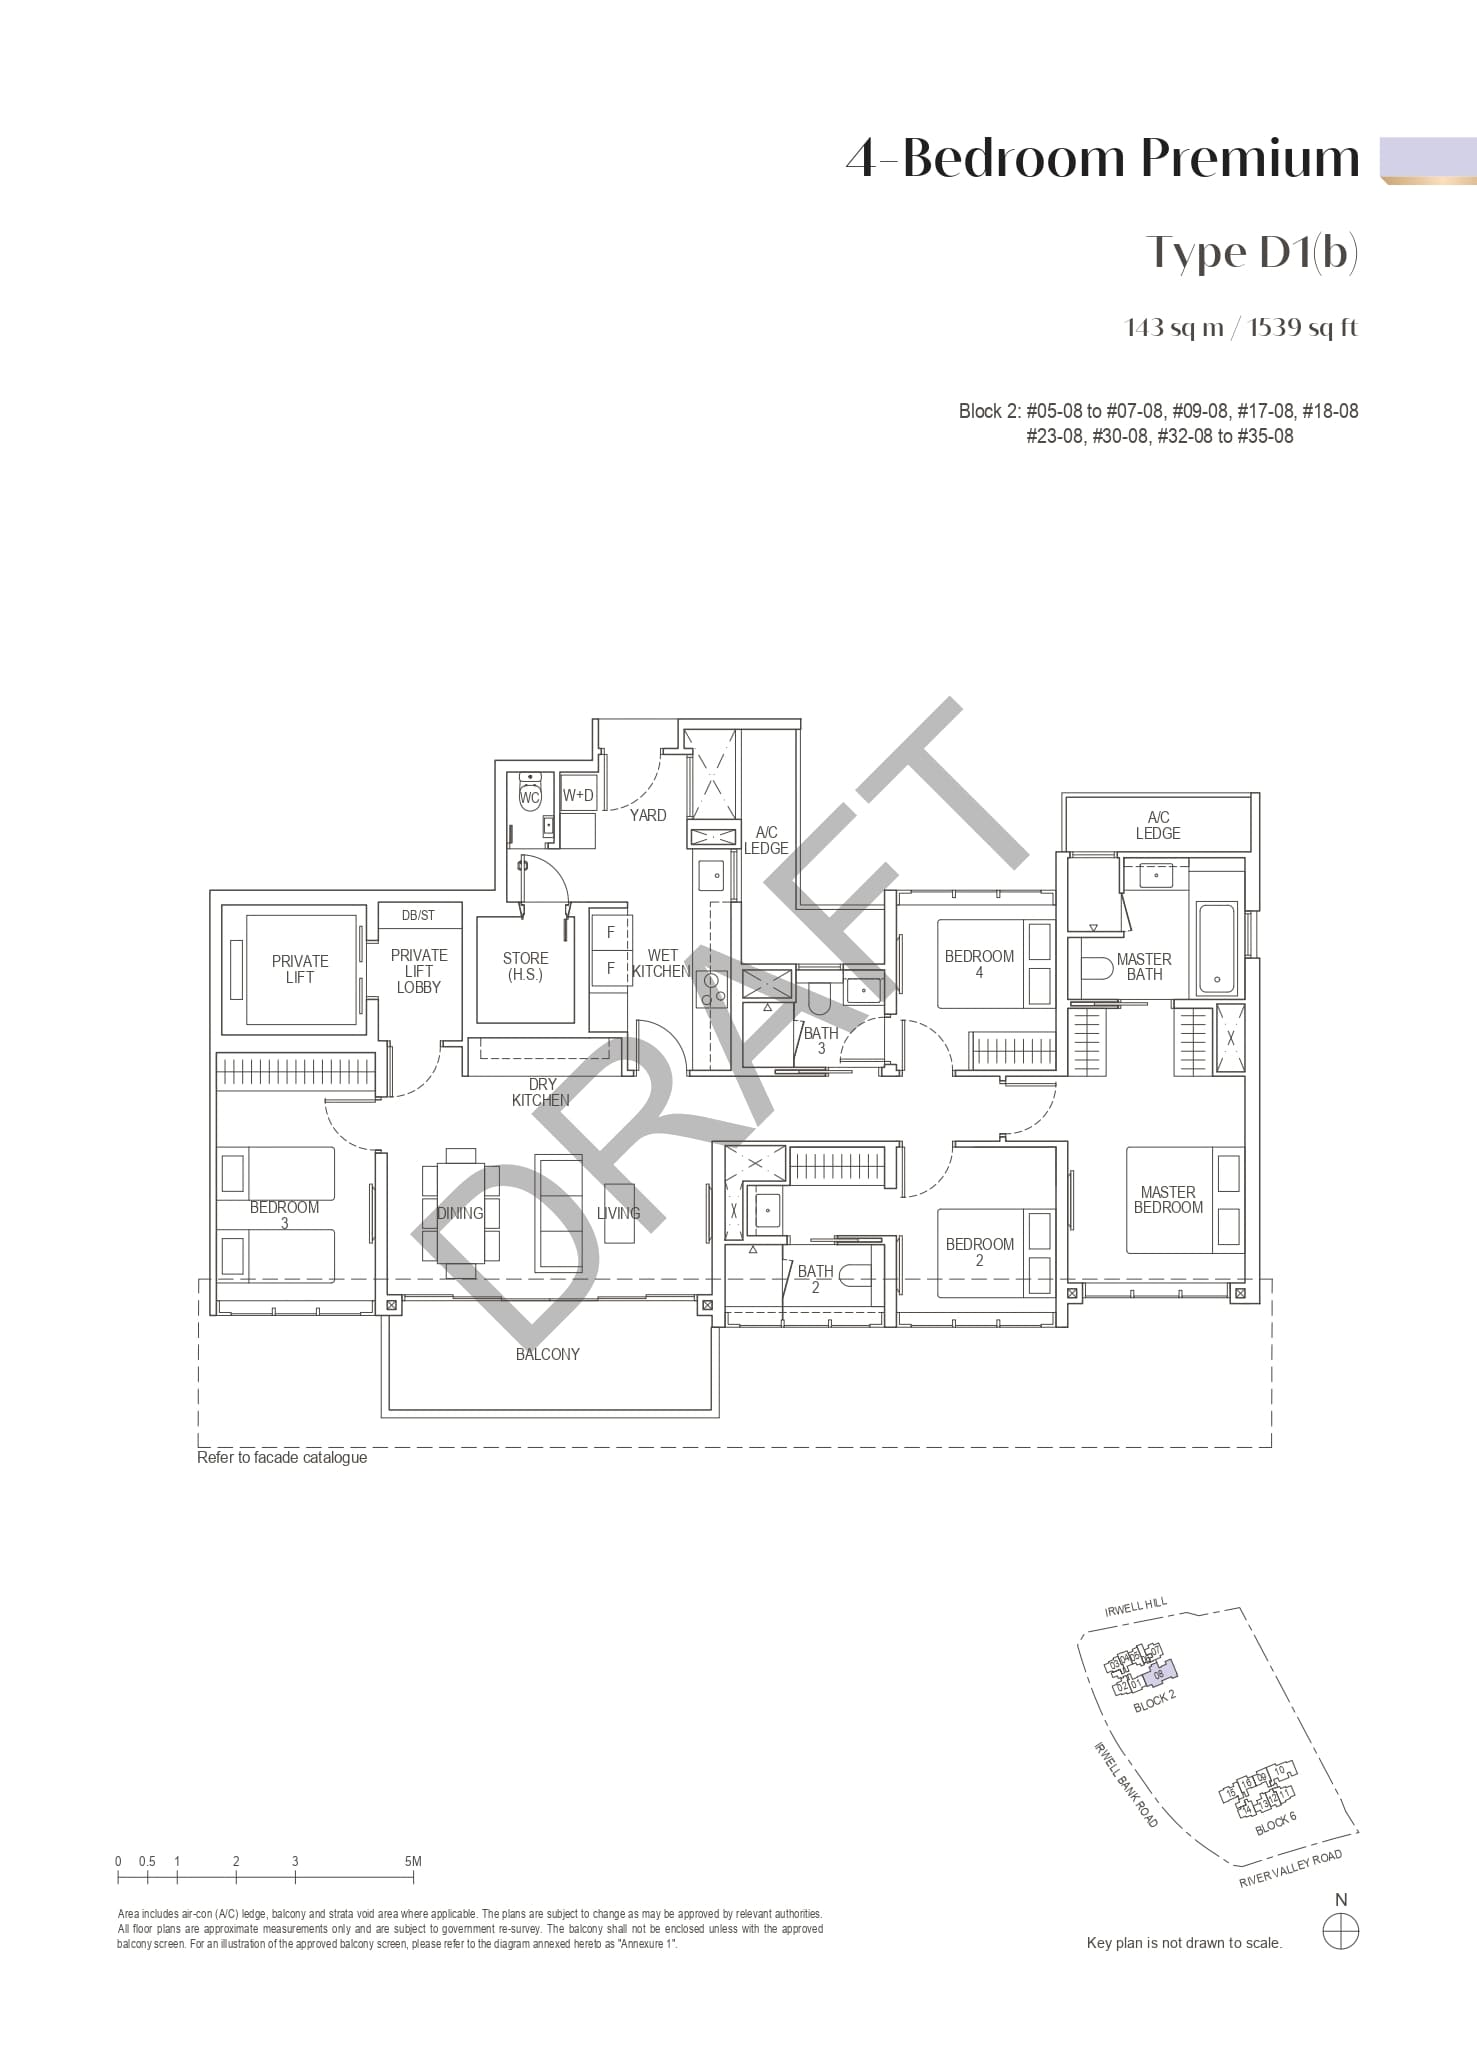 irwell-hill-residences-floor-plan-4-bedroom-premium-type-d1b